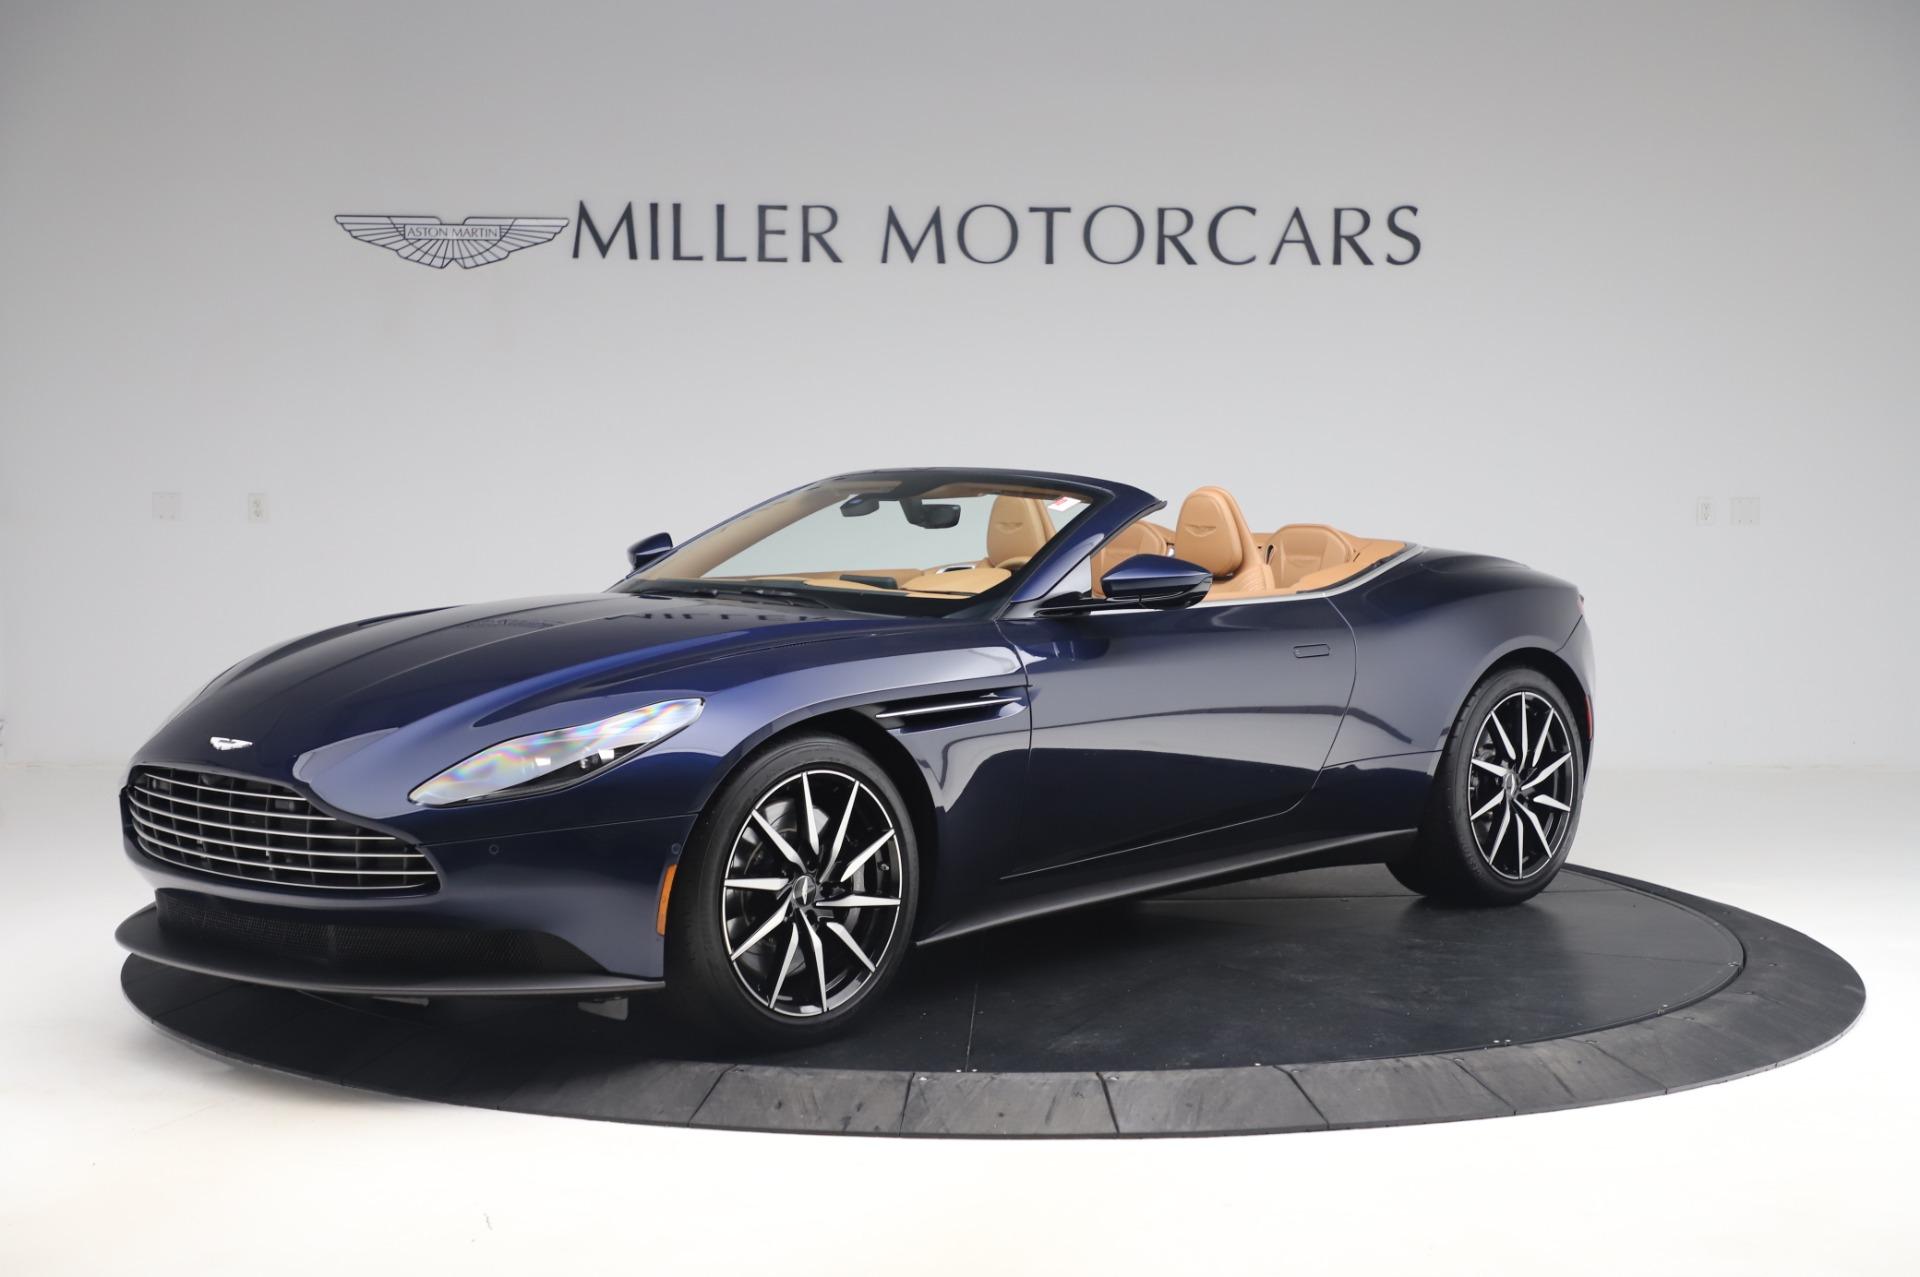 New 2020 Aston Martin DB11 Volante Volante for sale $248,326 at Bentley Greenwich in Greenwich CT 06830 1